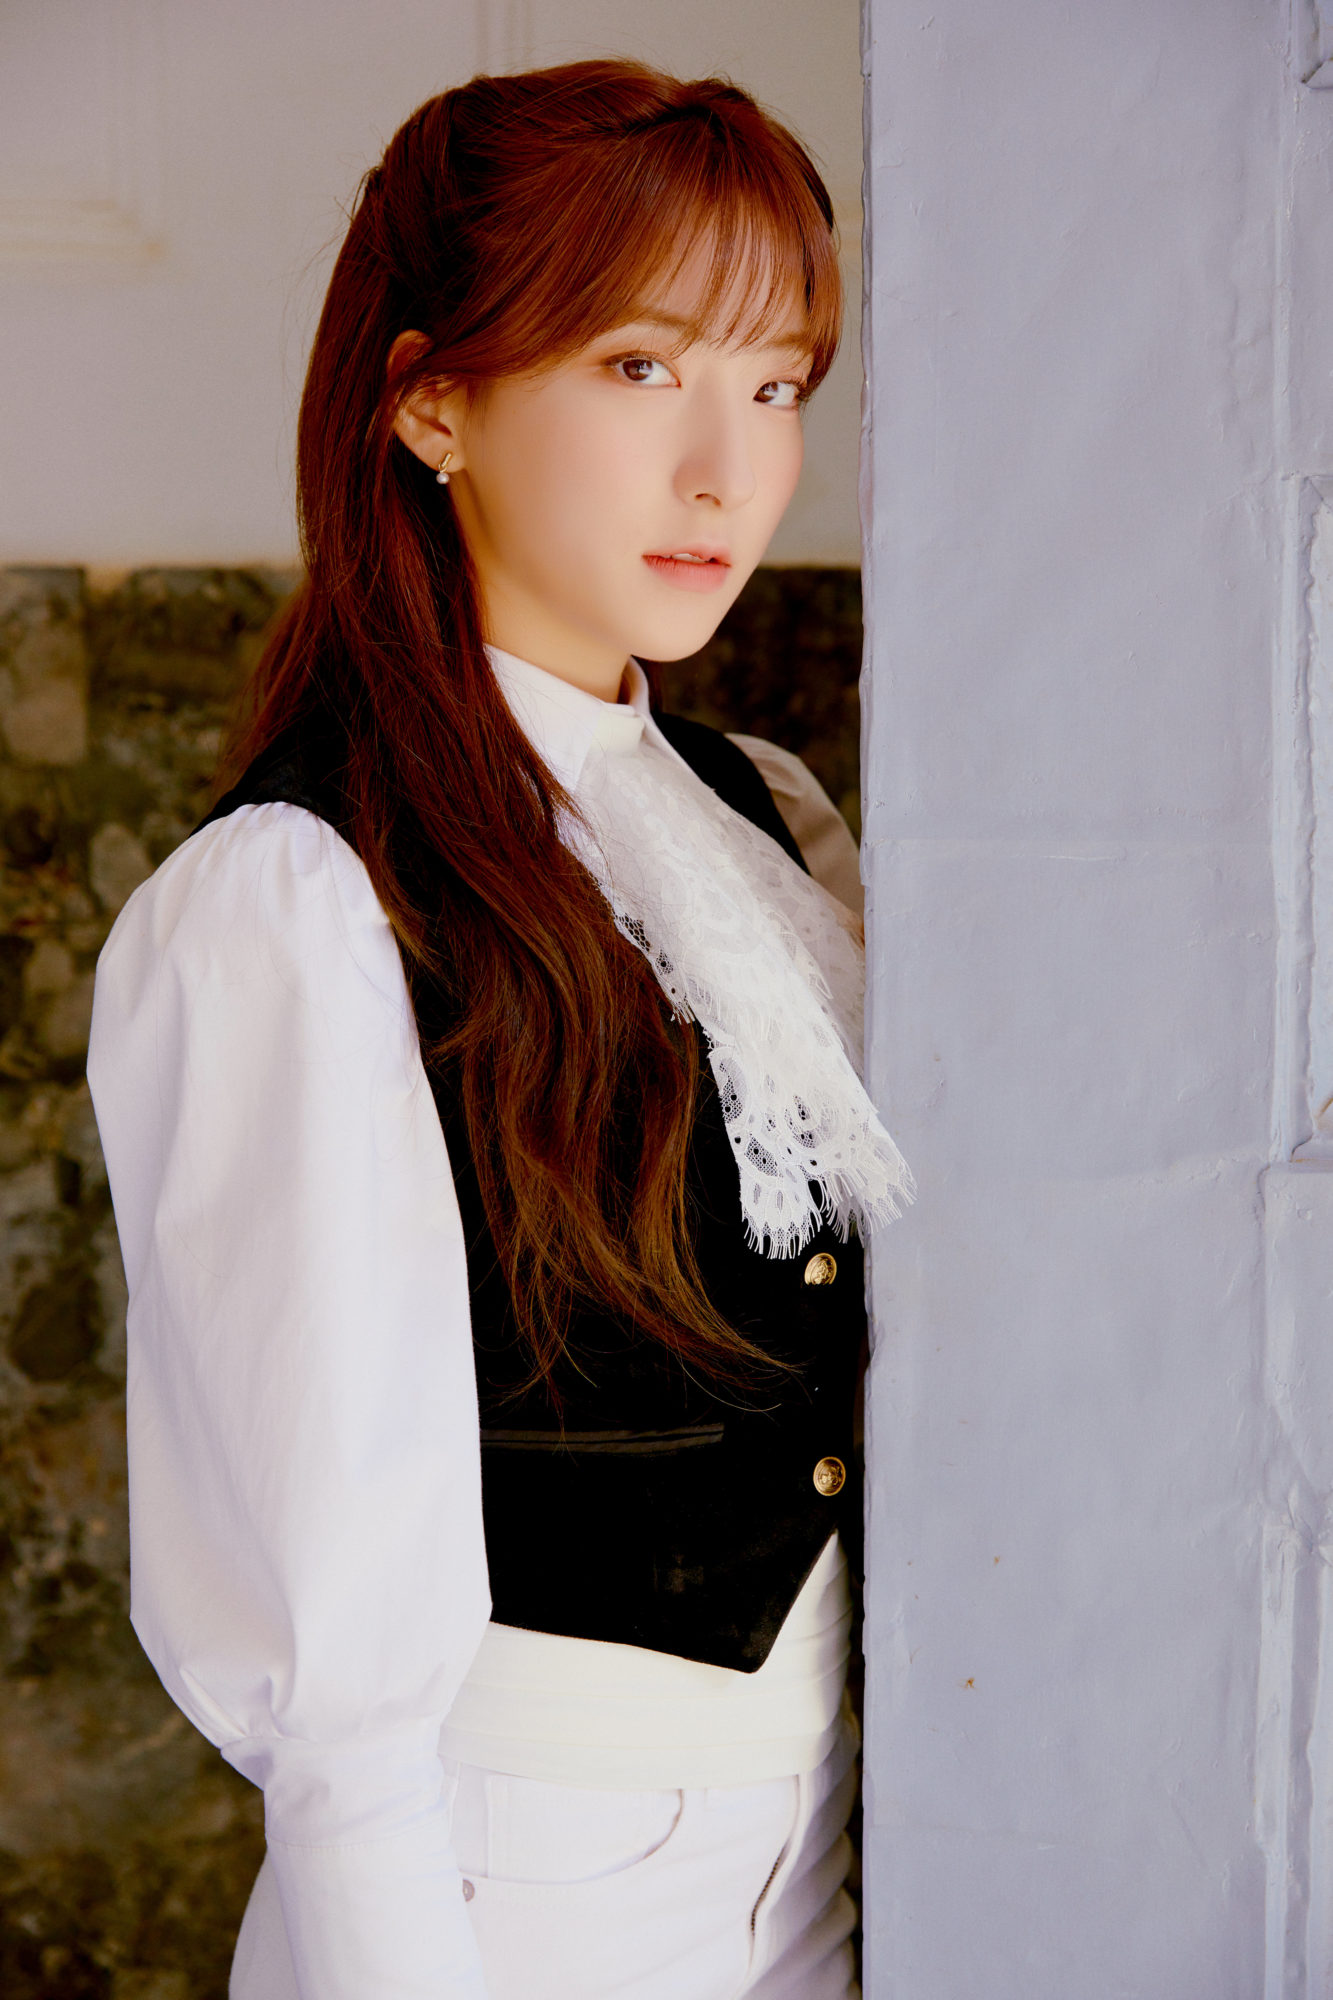 WJSN Eunseo As You Wish Concept